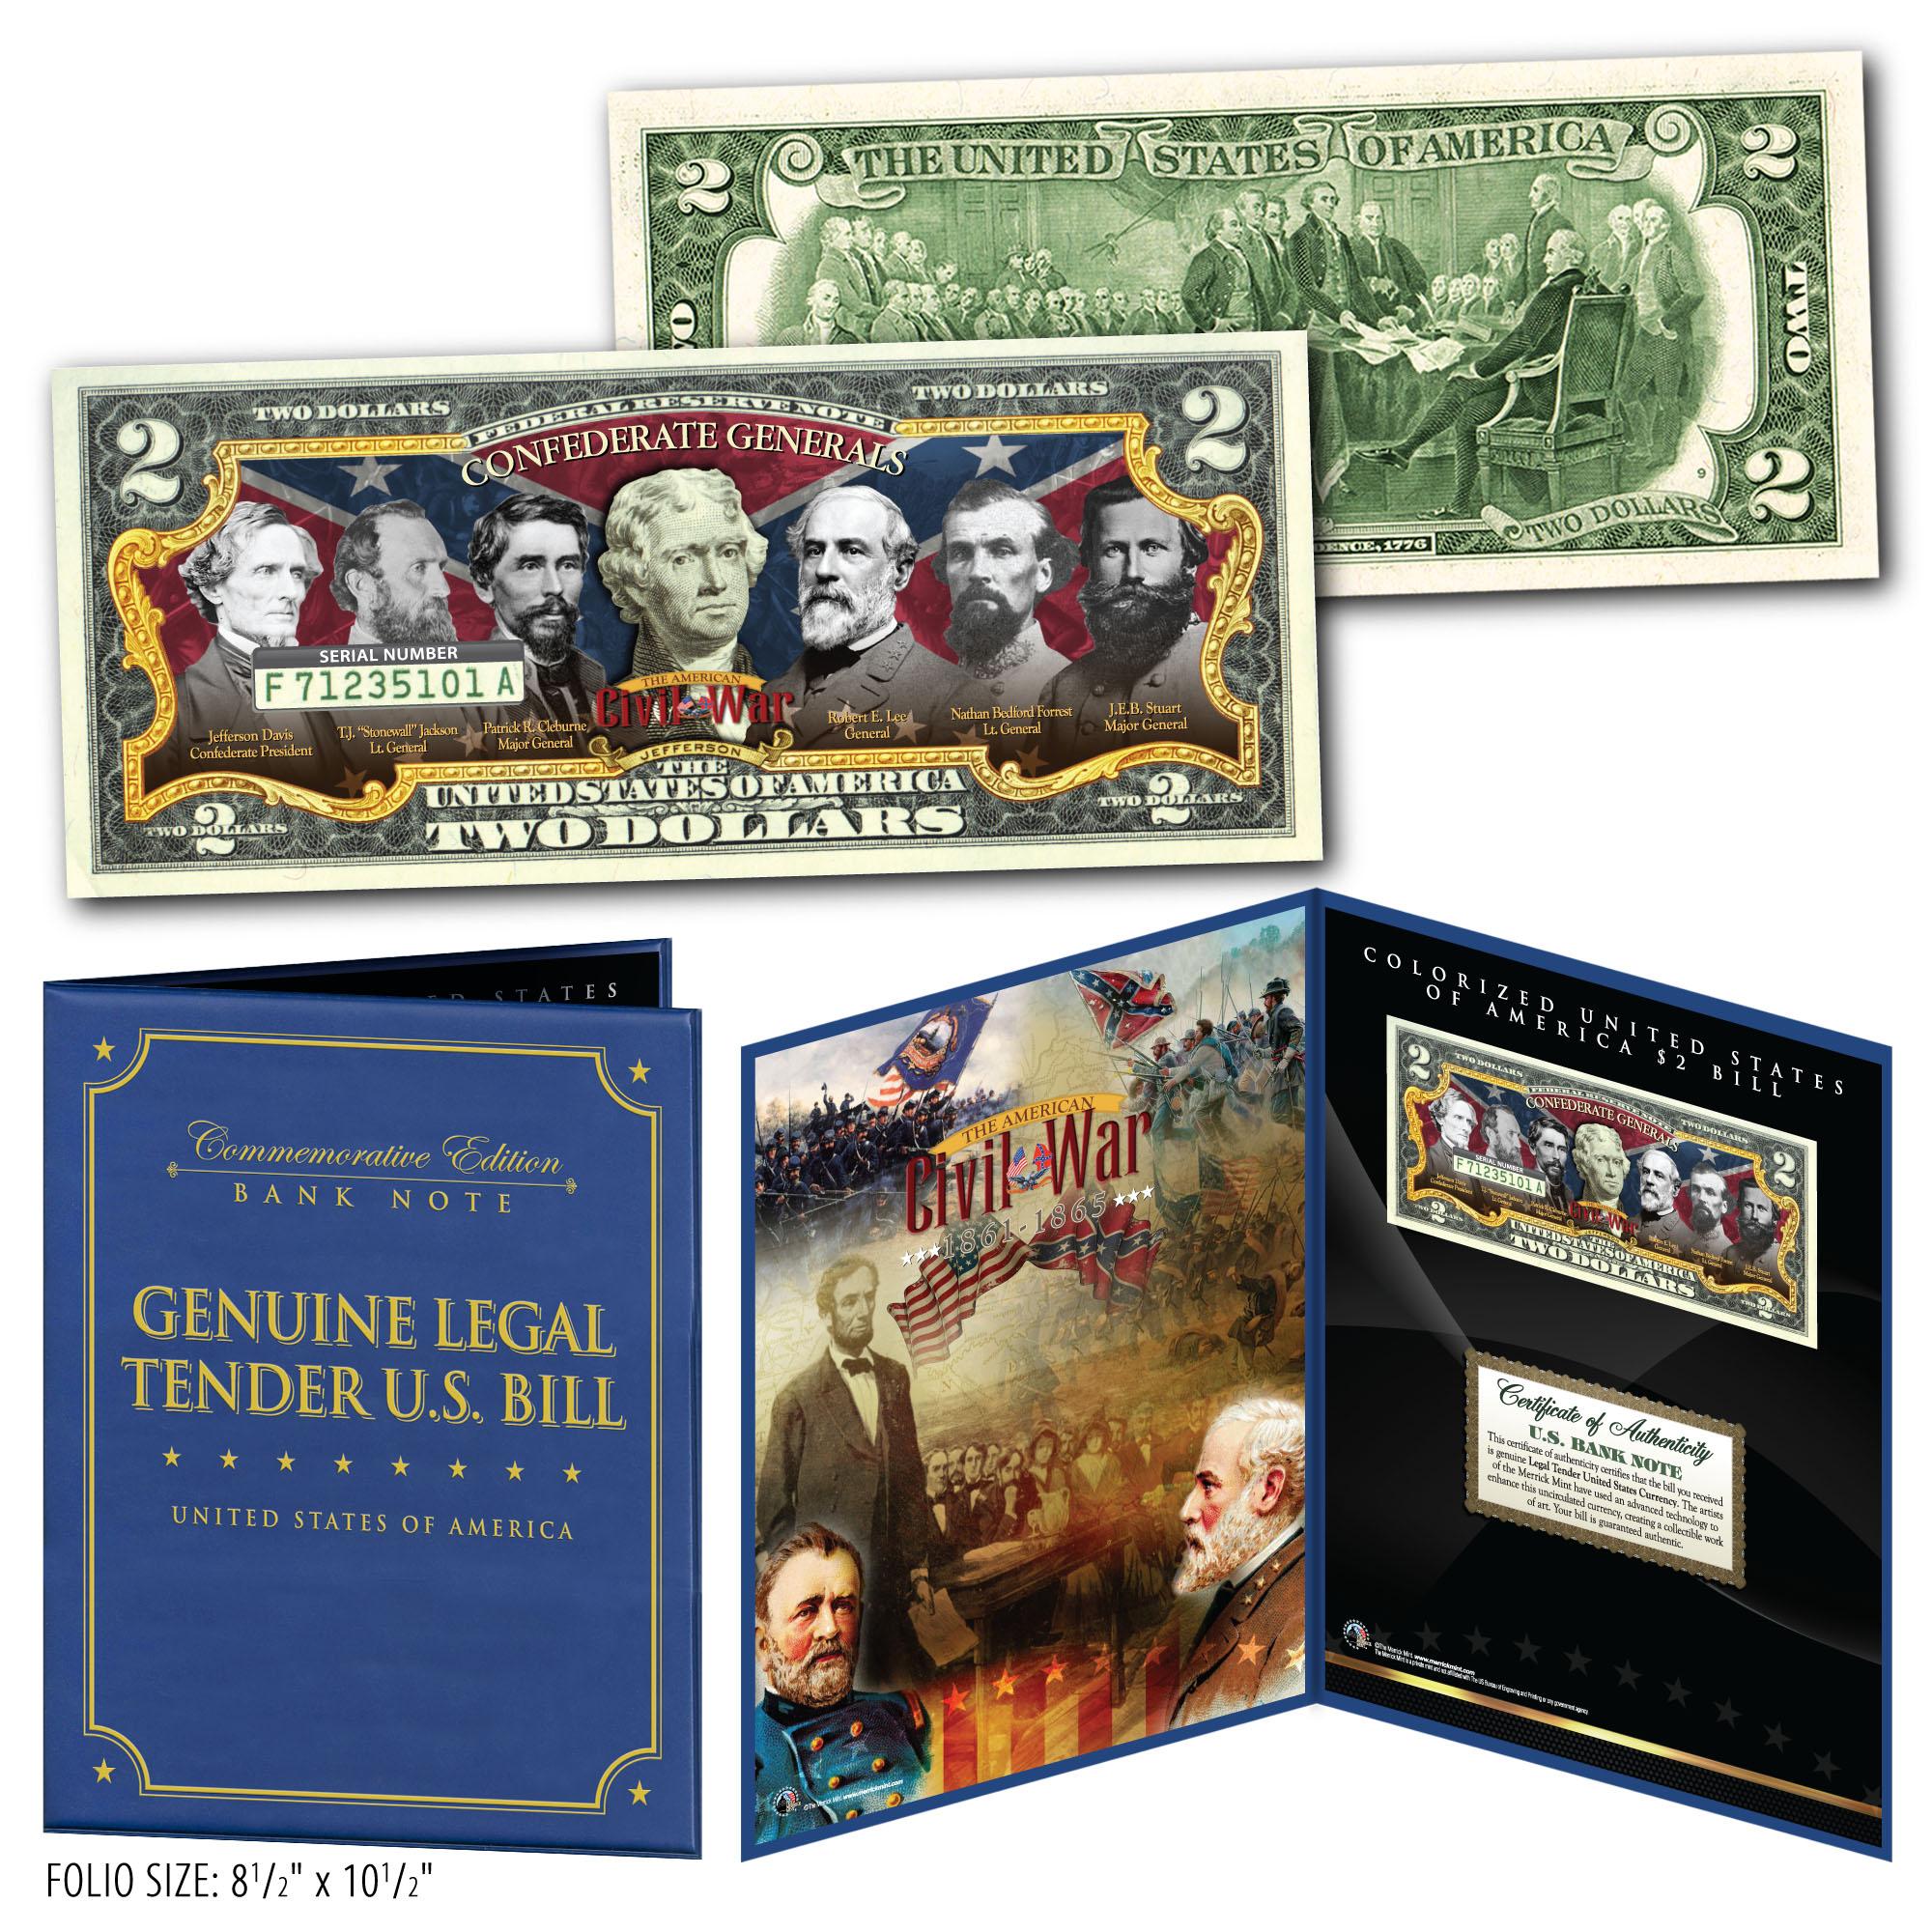 2006 Collectorama Souvenir Card Oct 1862 $10.00 Confederate T48 Essay L30